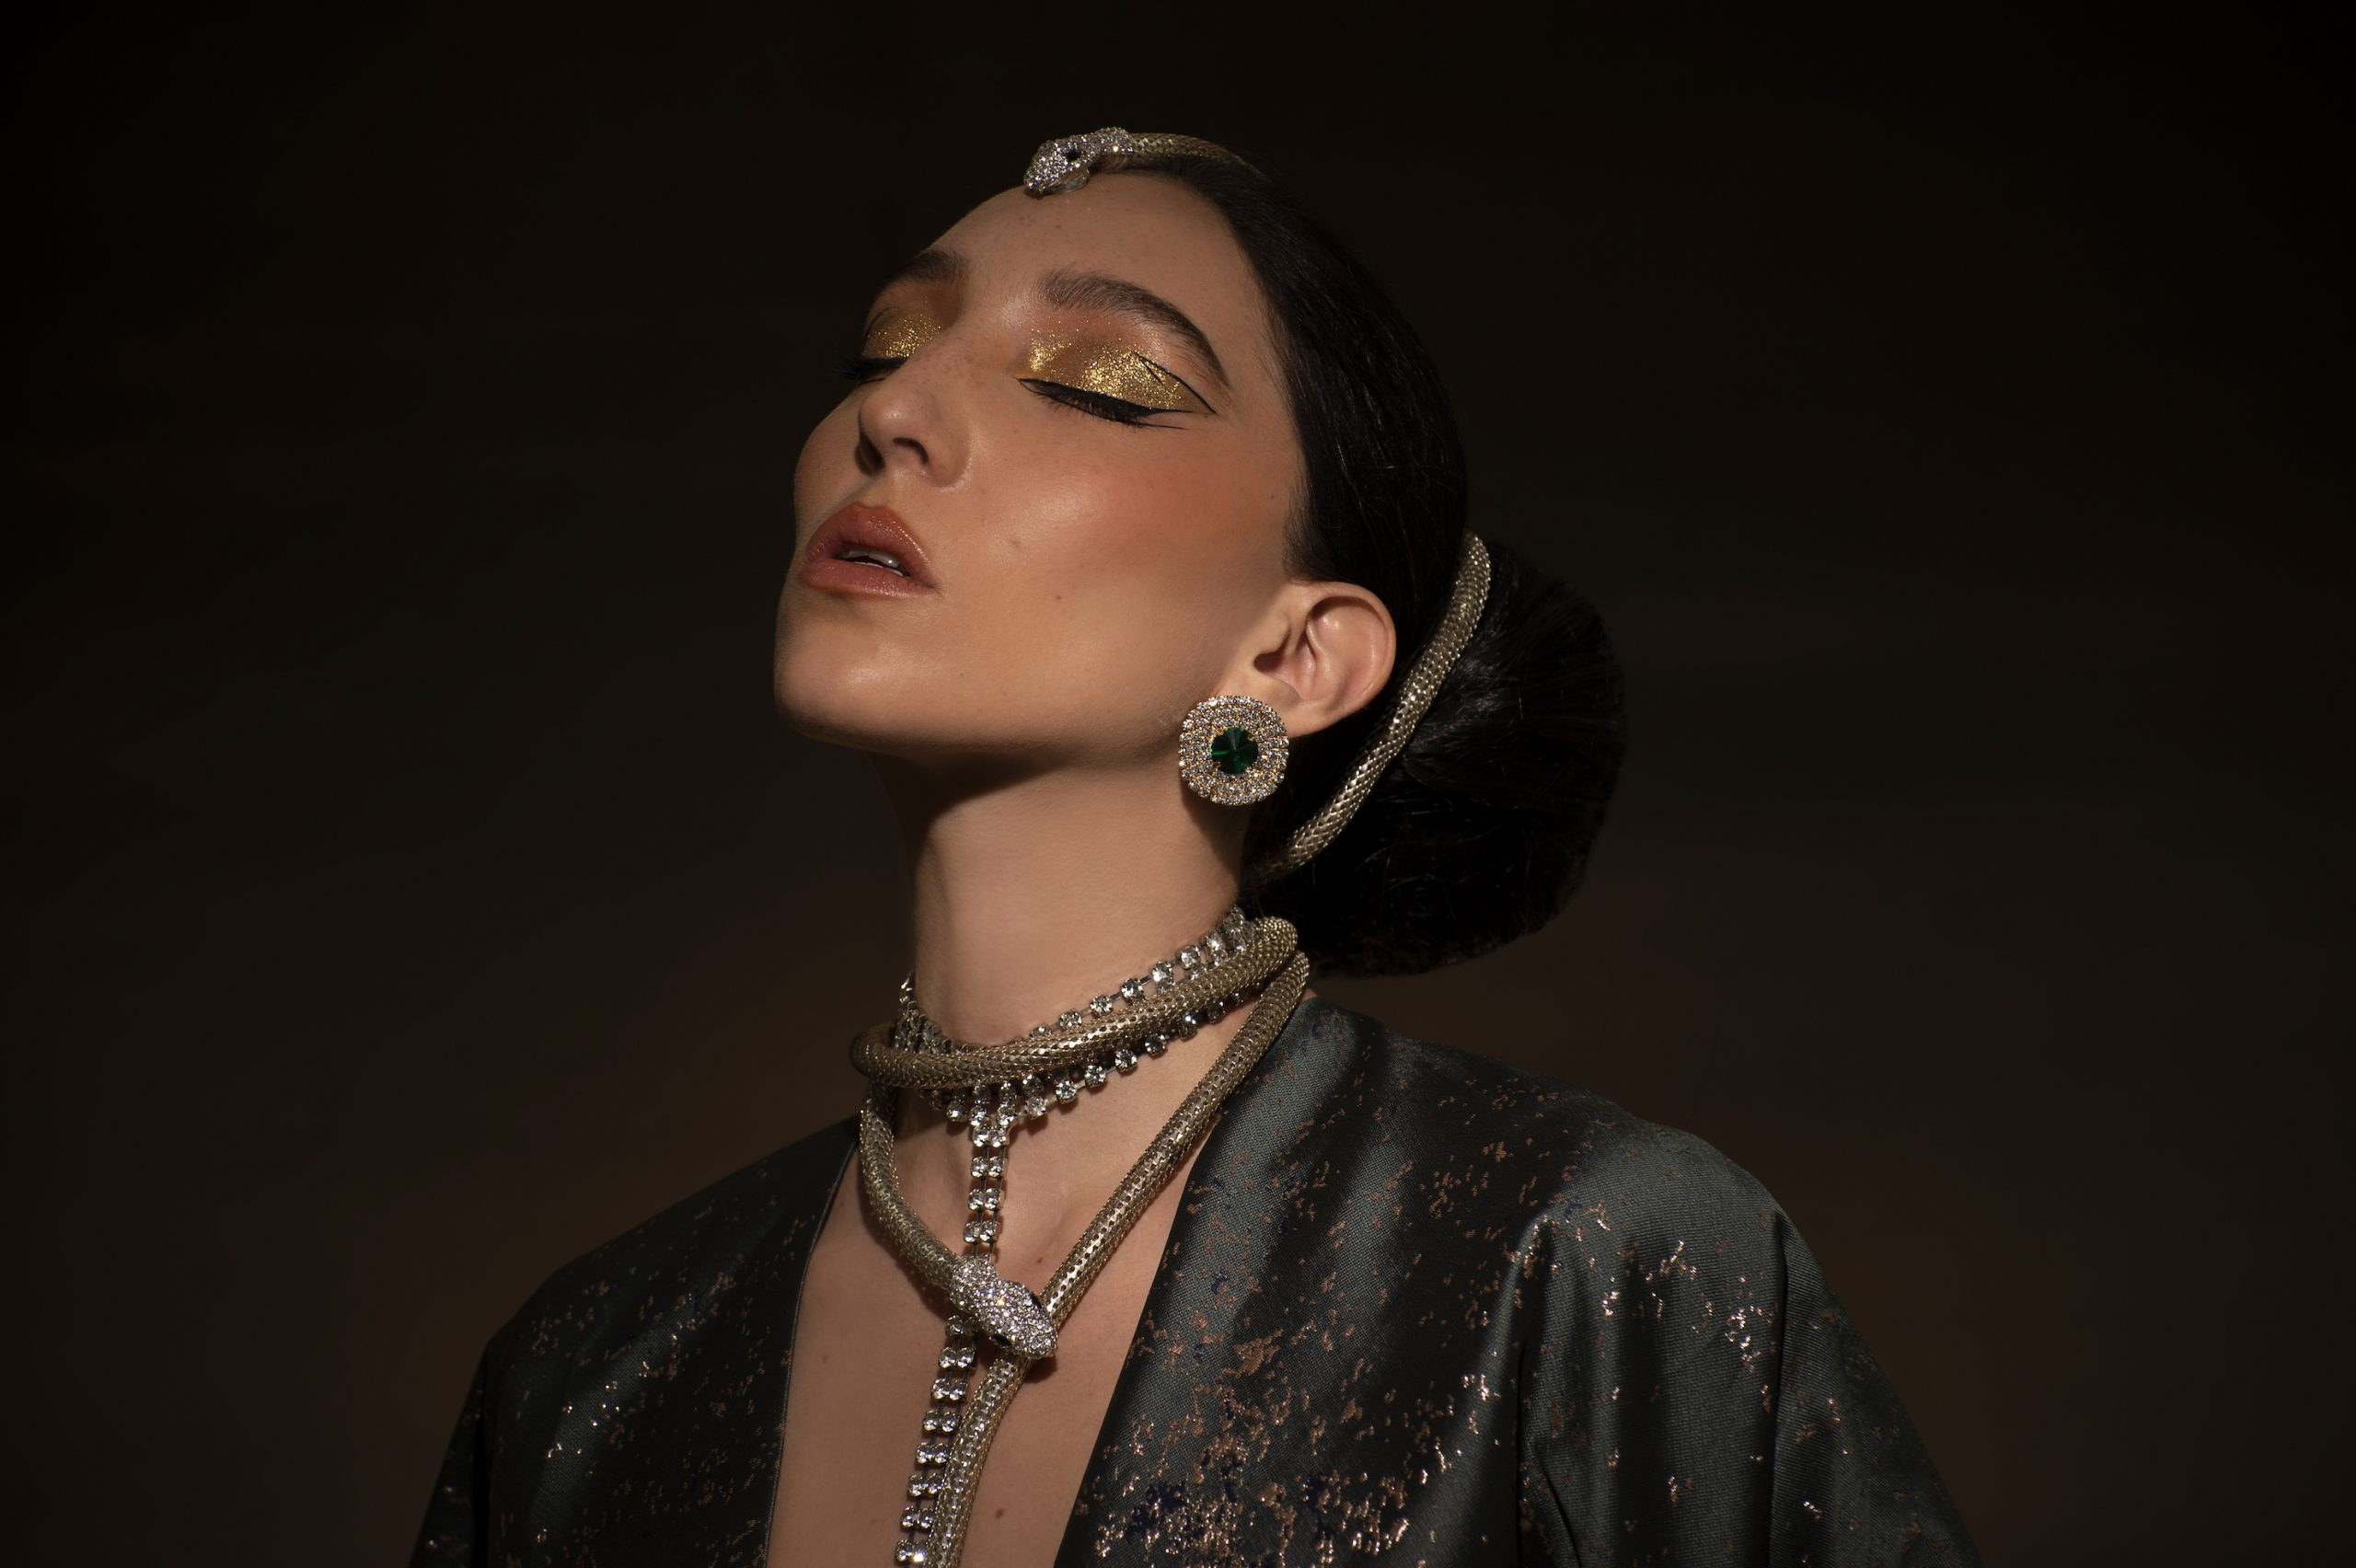 The artist community portada 53 makeup Ariel Peimbert